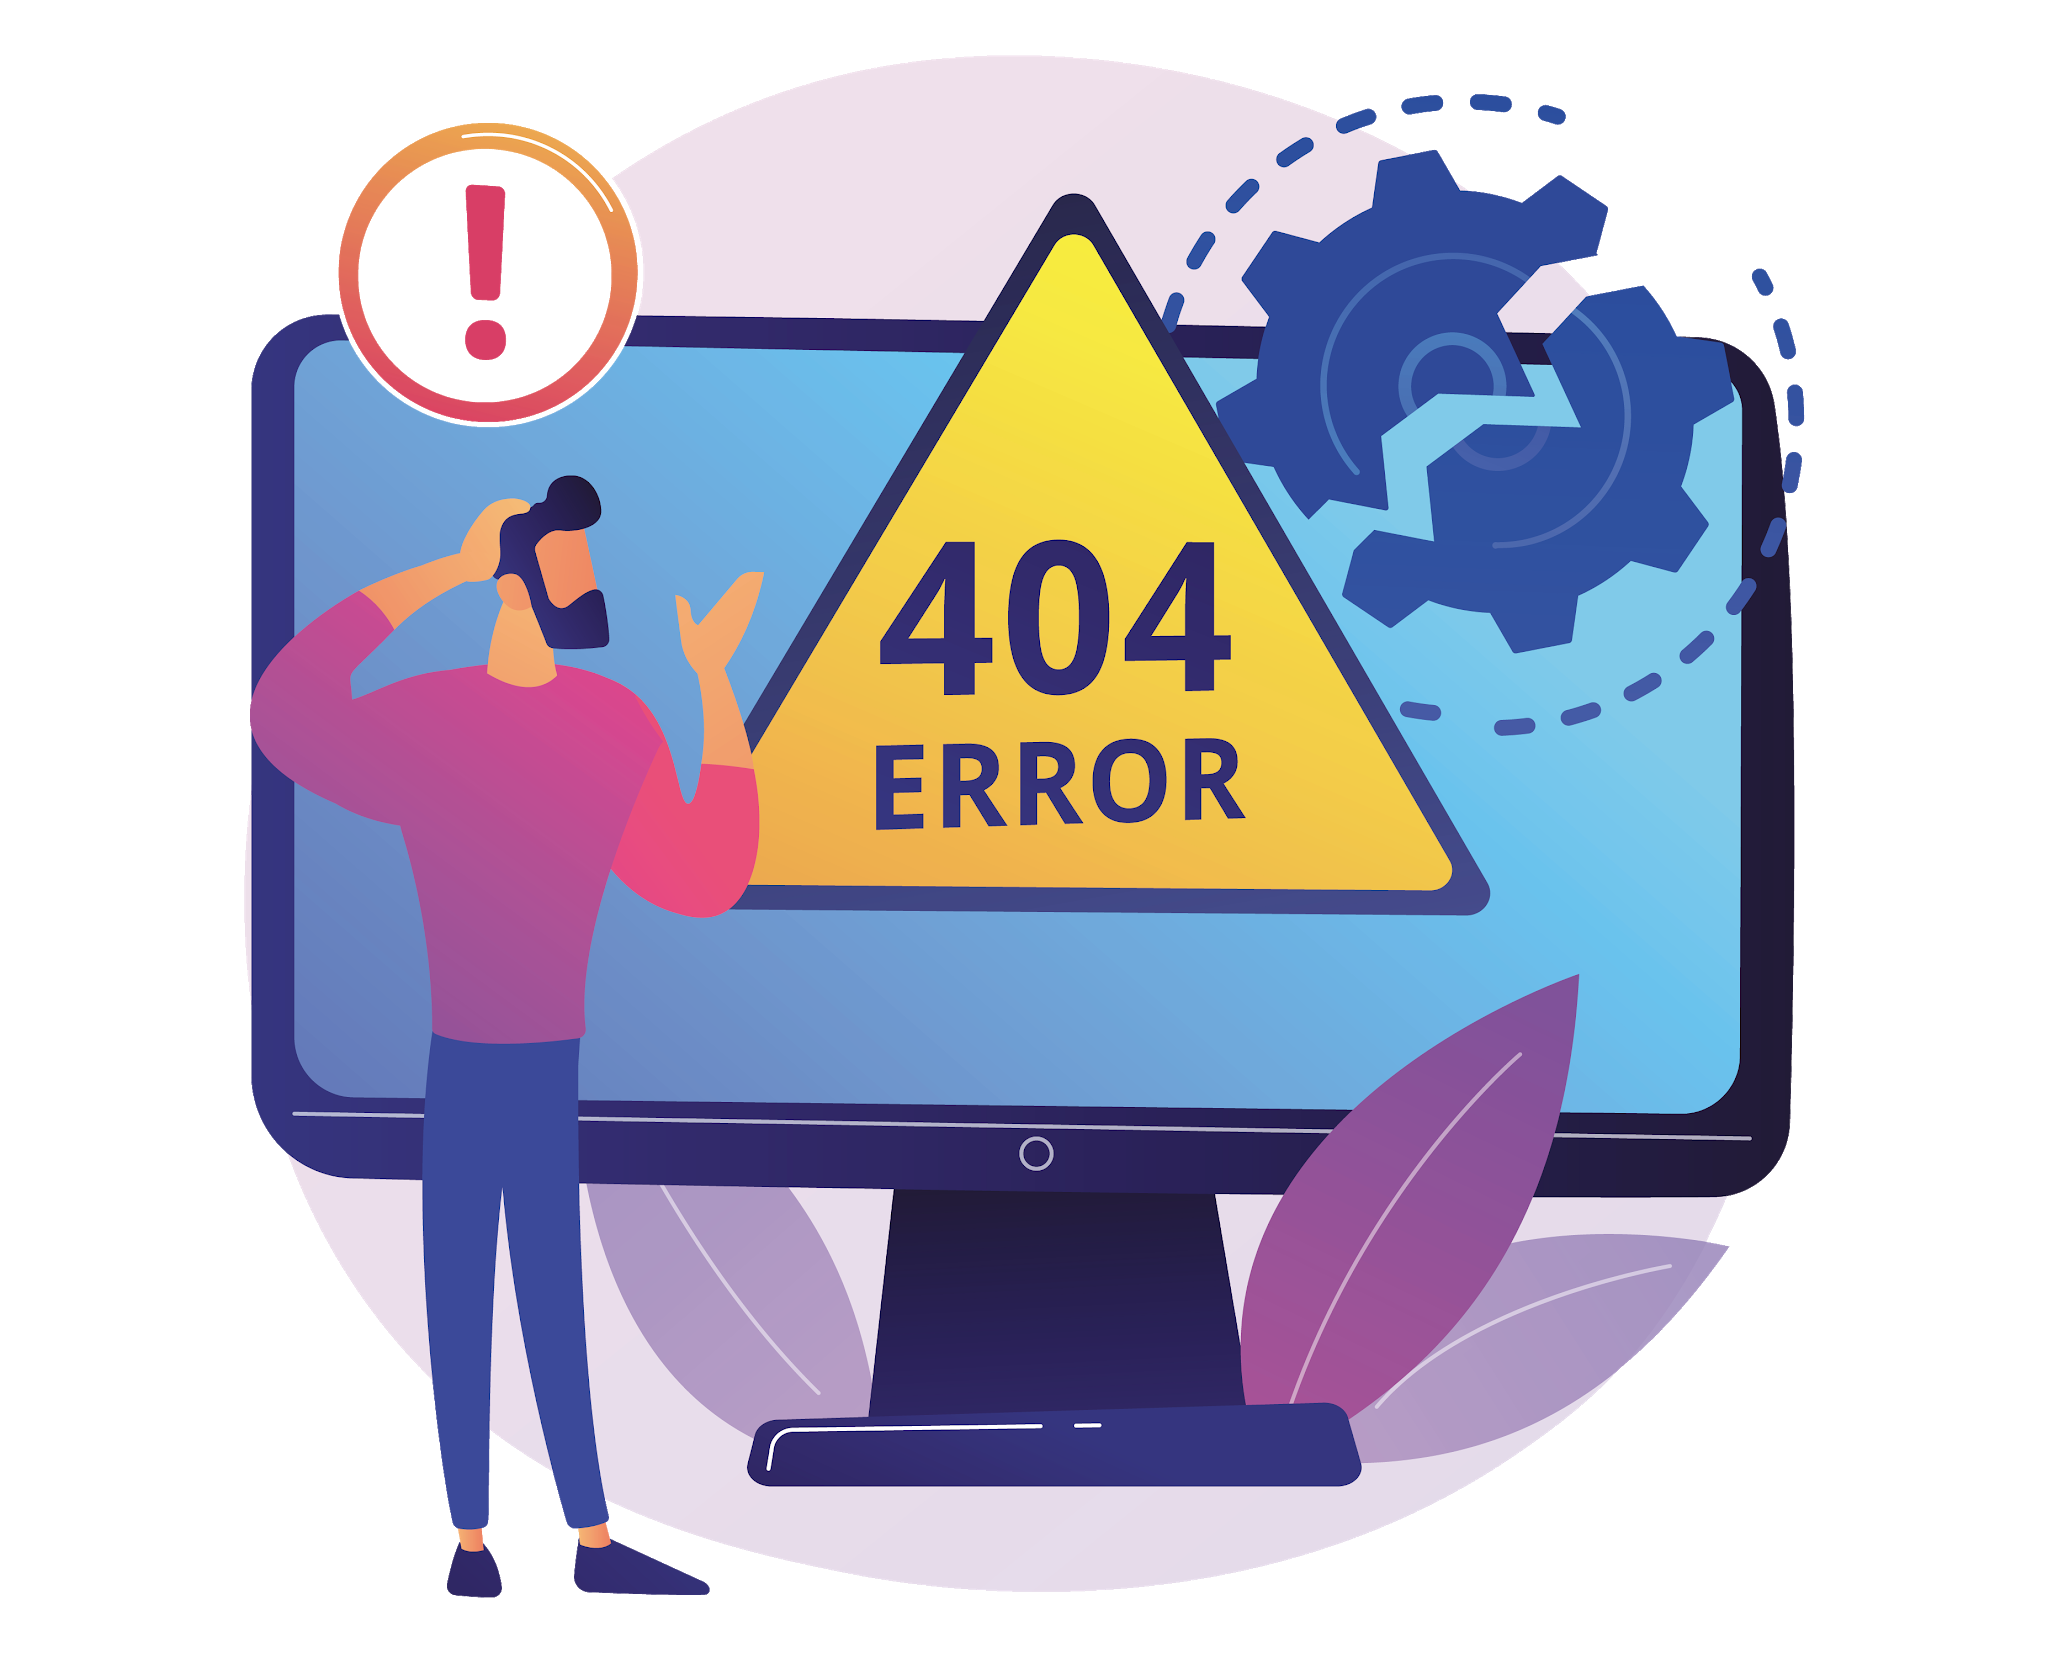 Dịch vụ sửa chữa website